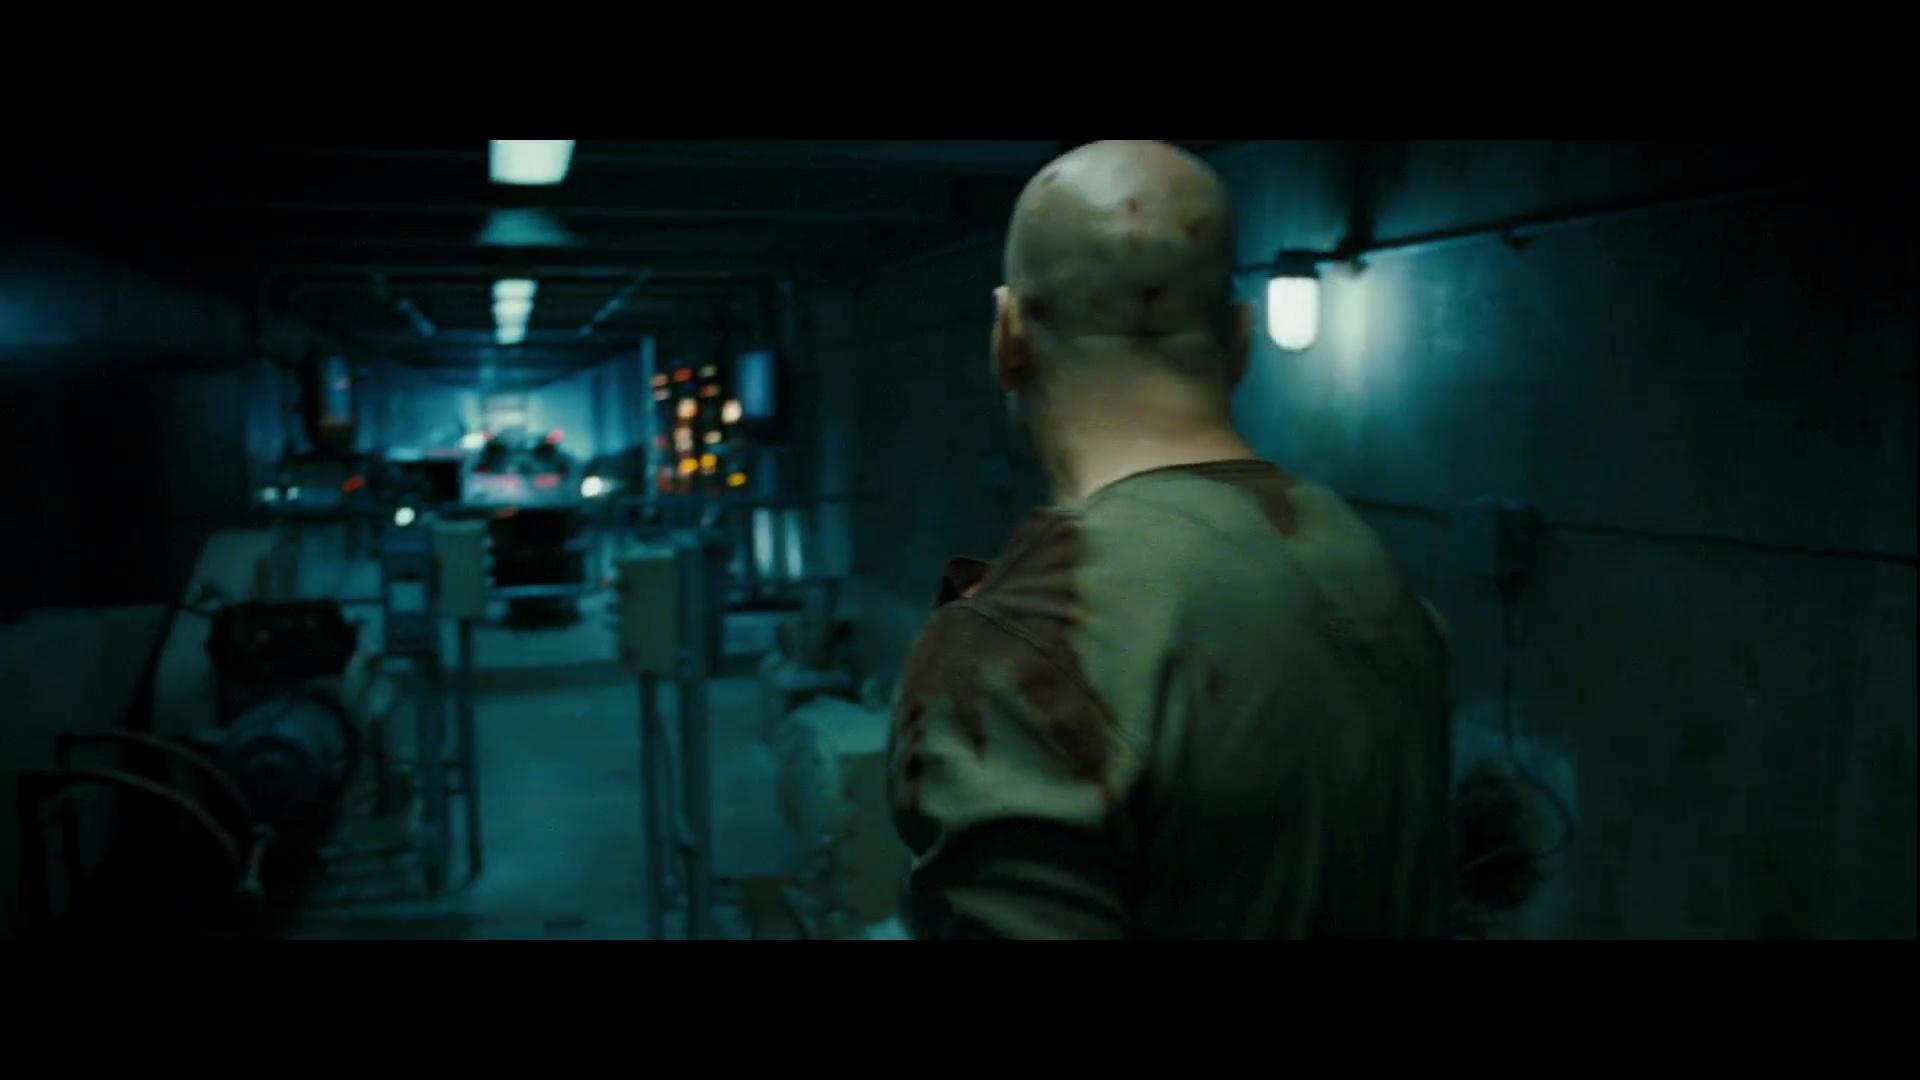 Duro De Matar 4 1080p Lat-Cast-Ing 5.1 (2007)